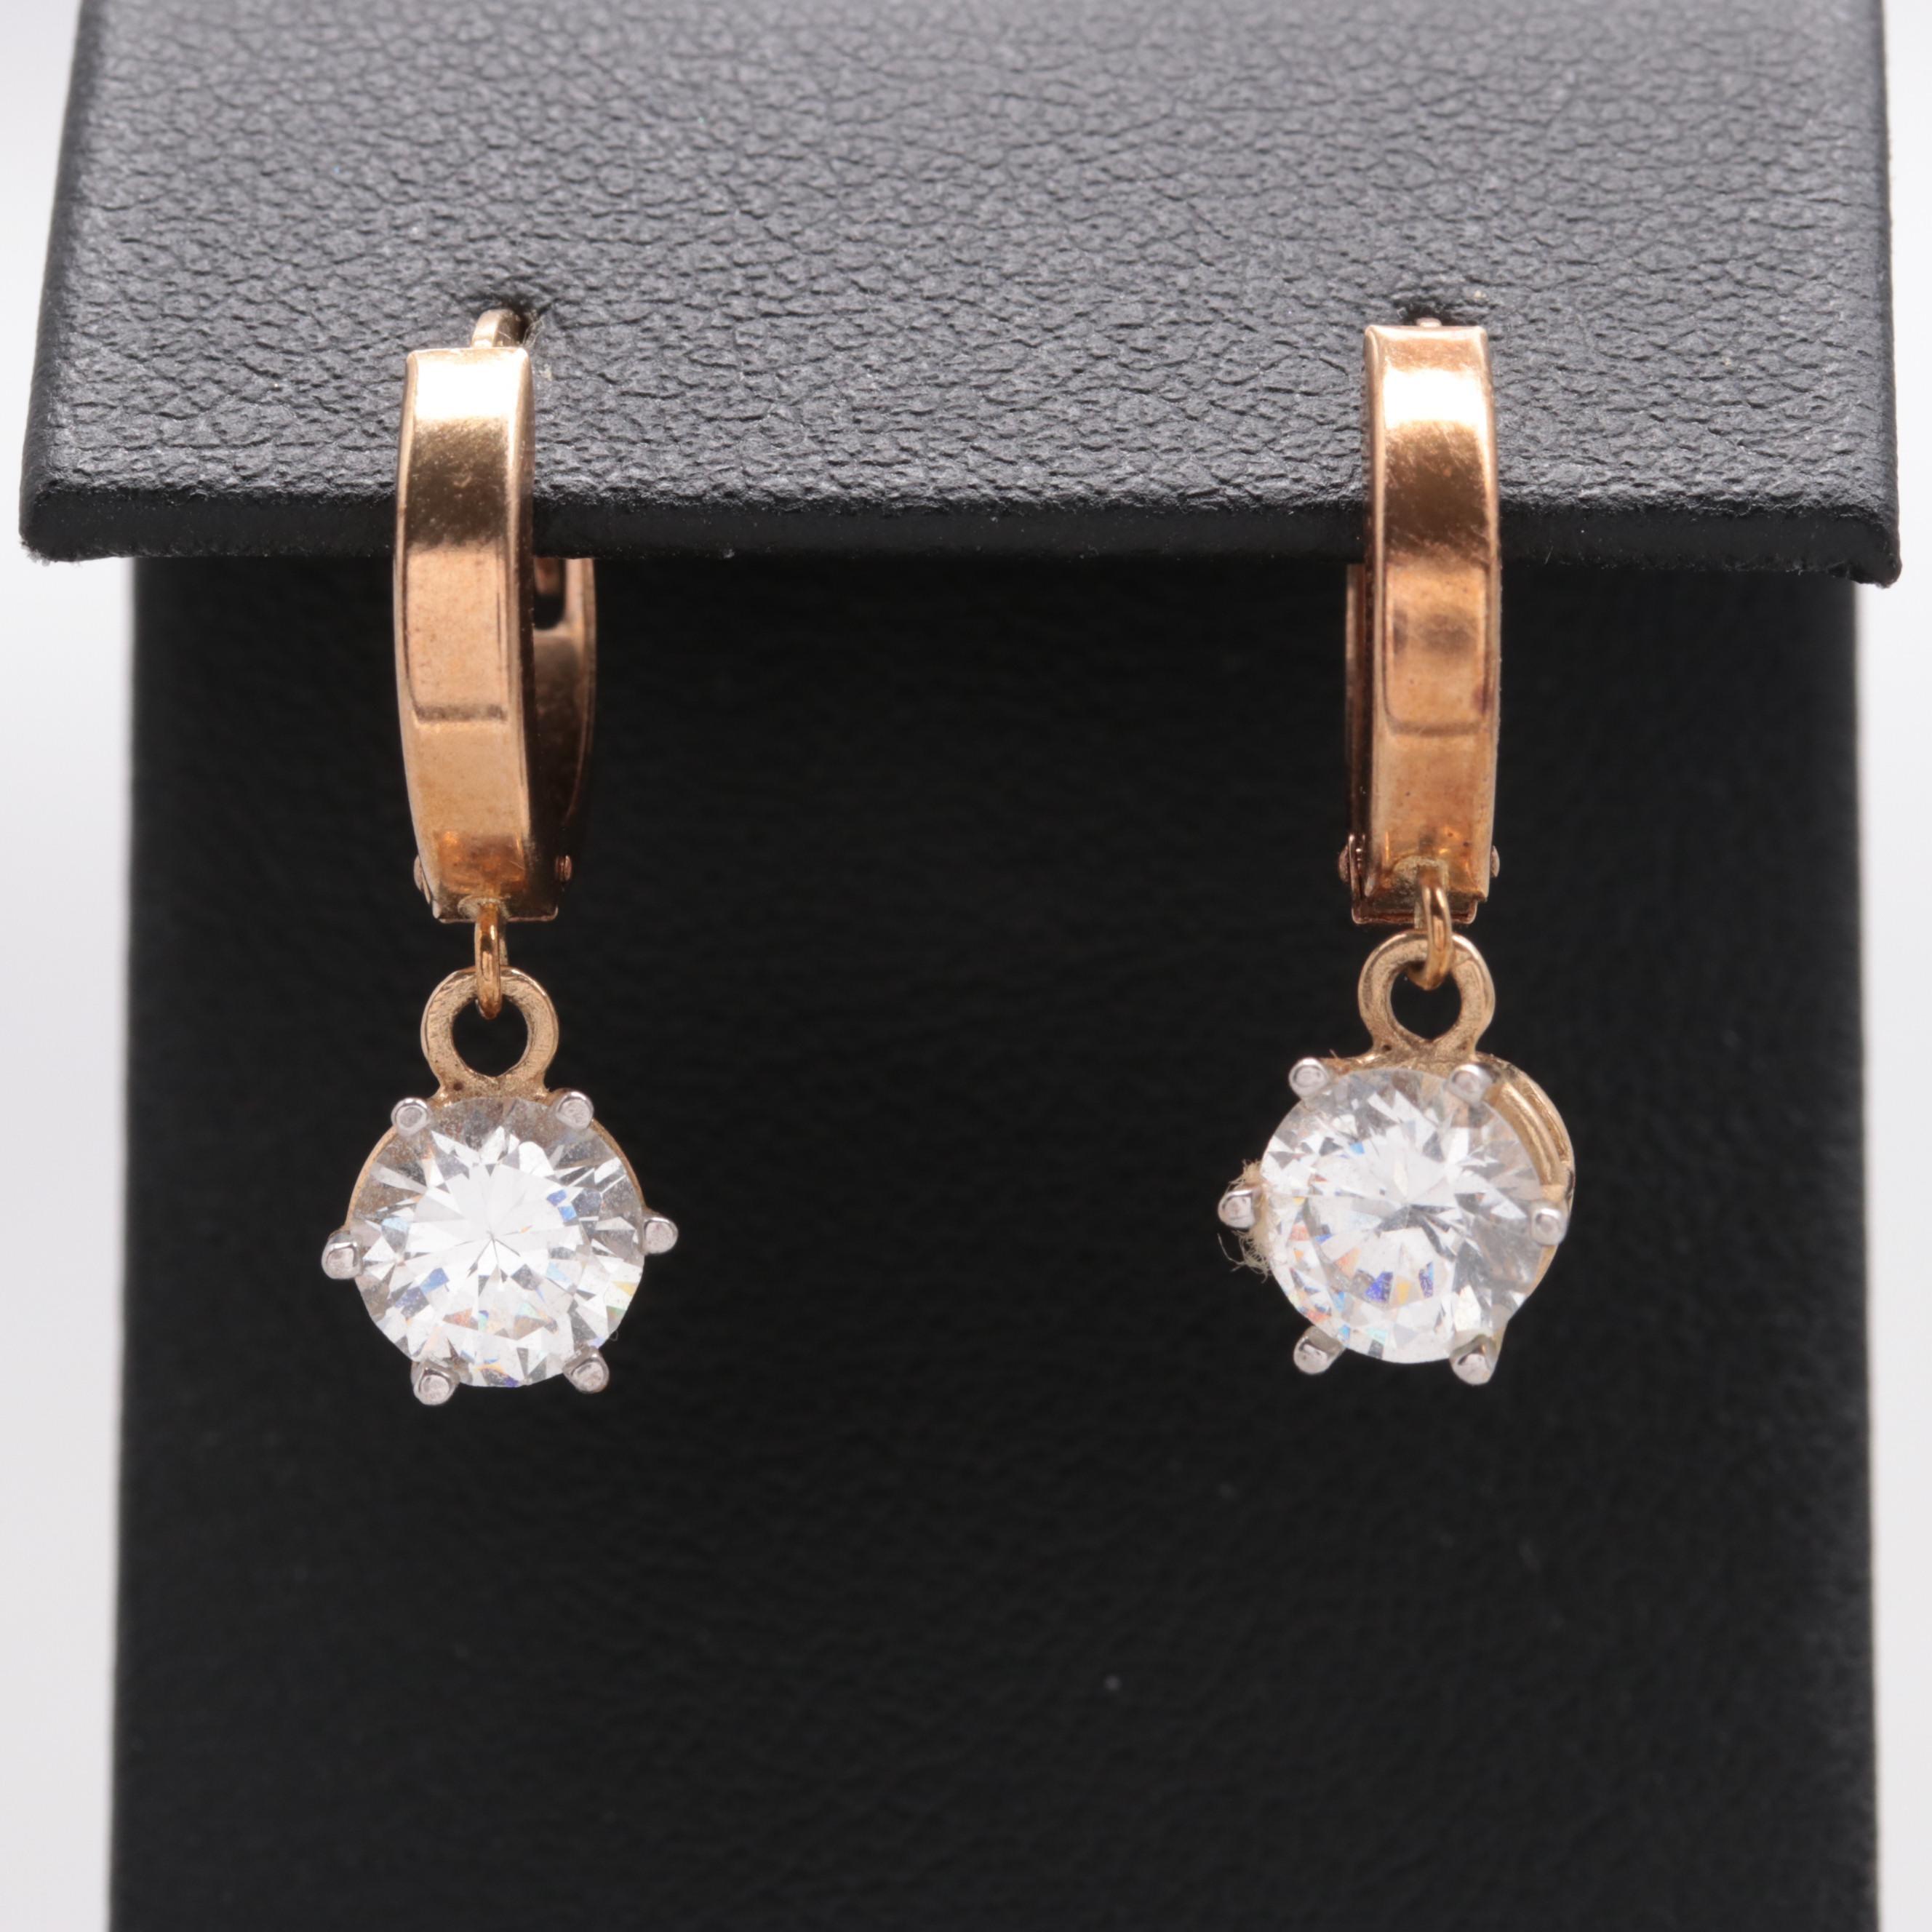 10K Yellow Gold Cubic Zirconia Earrings